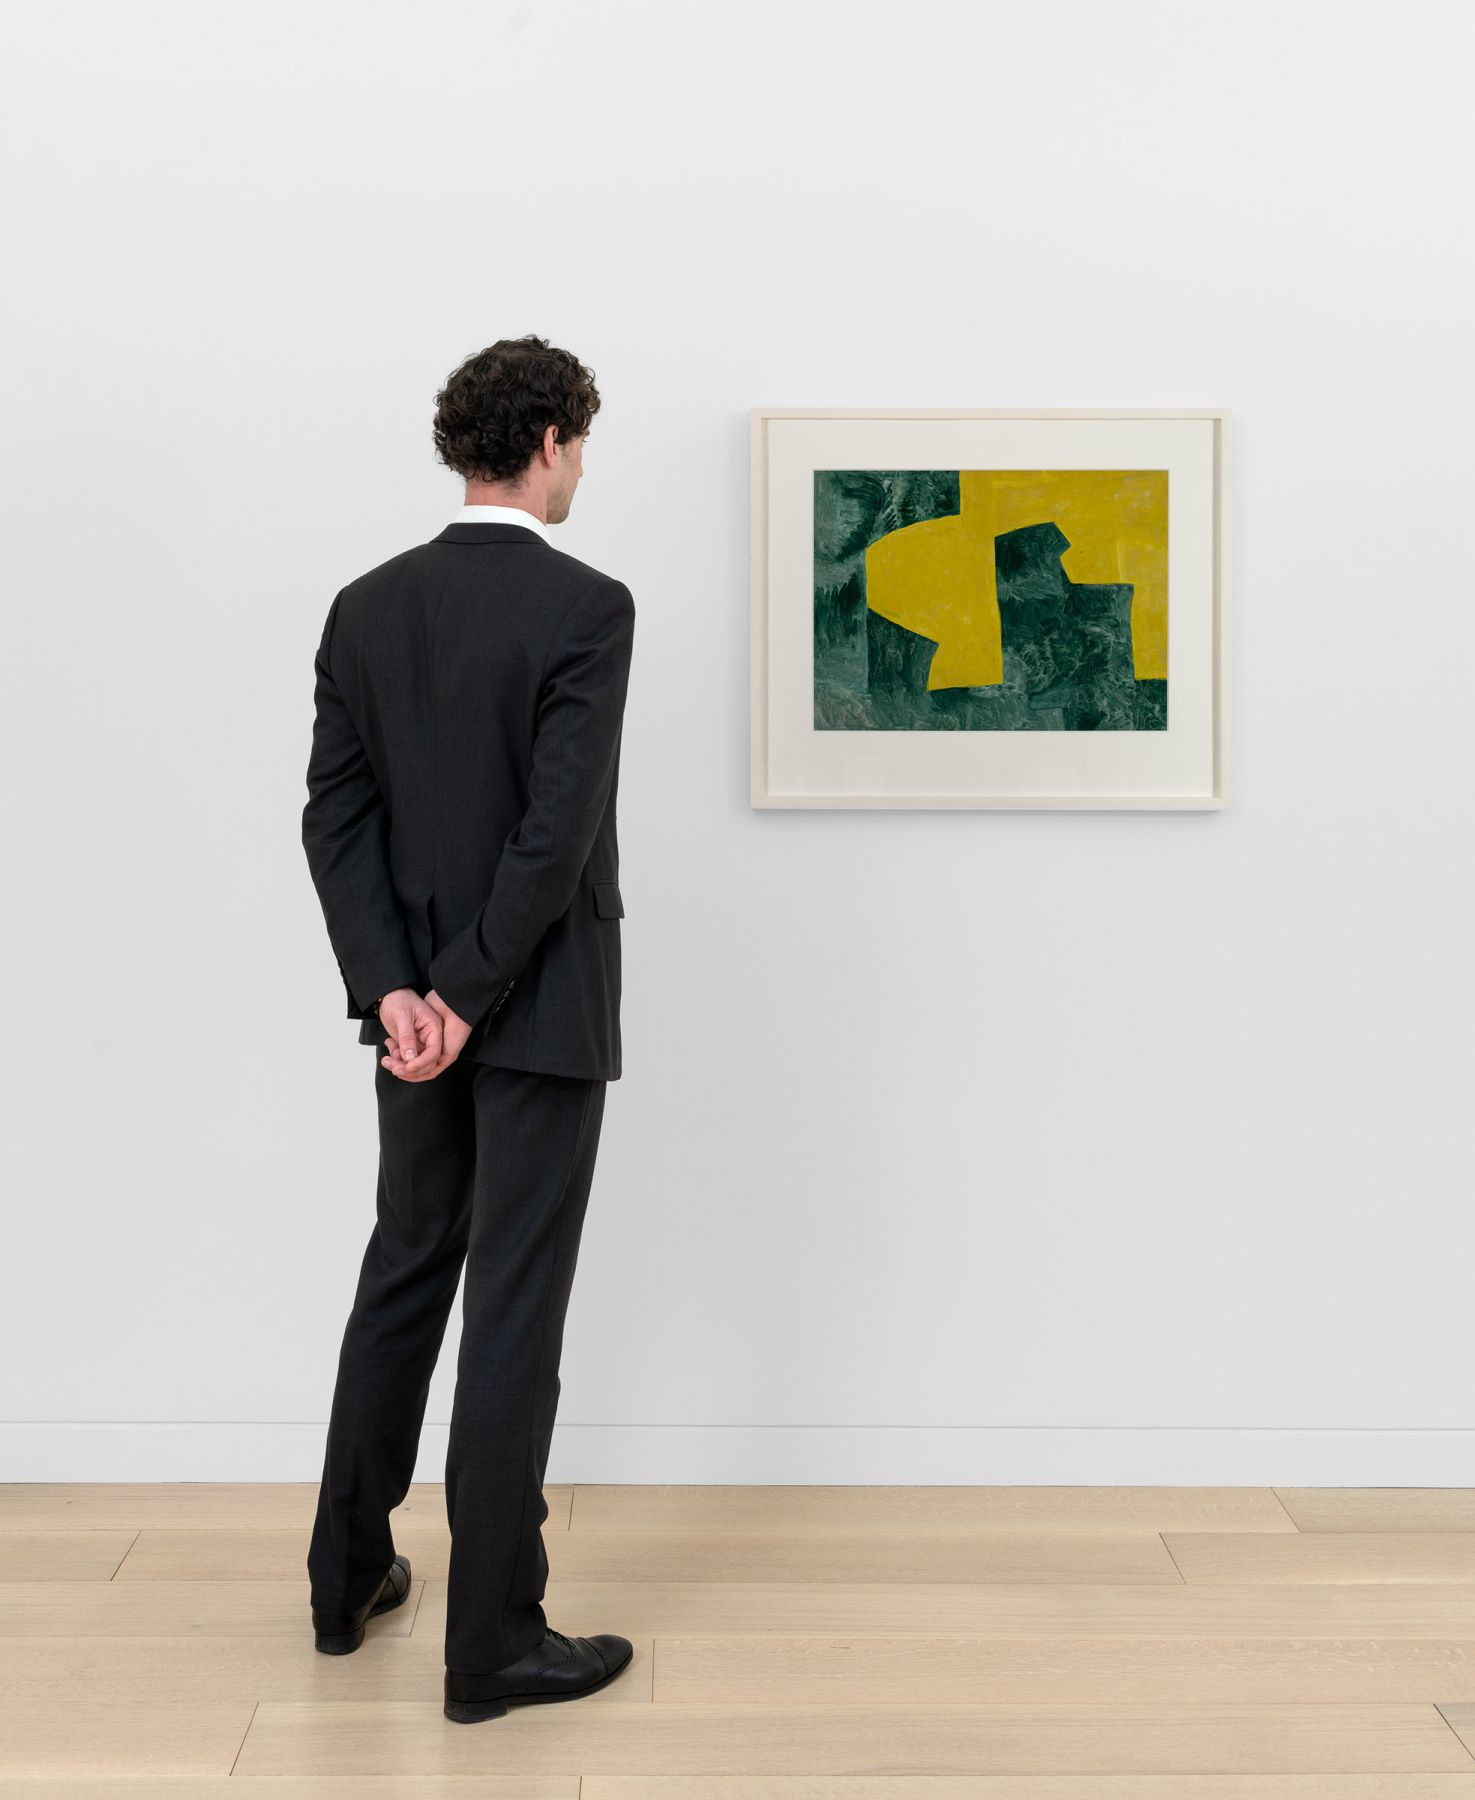 Serge Poliakoff - Jaune et Vert 2